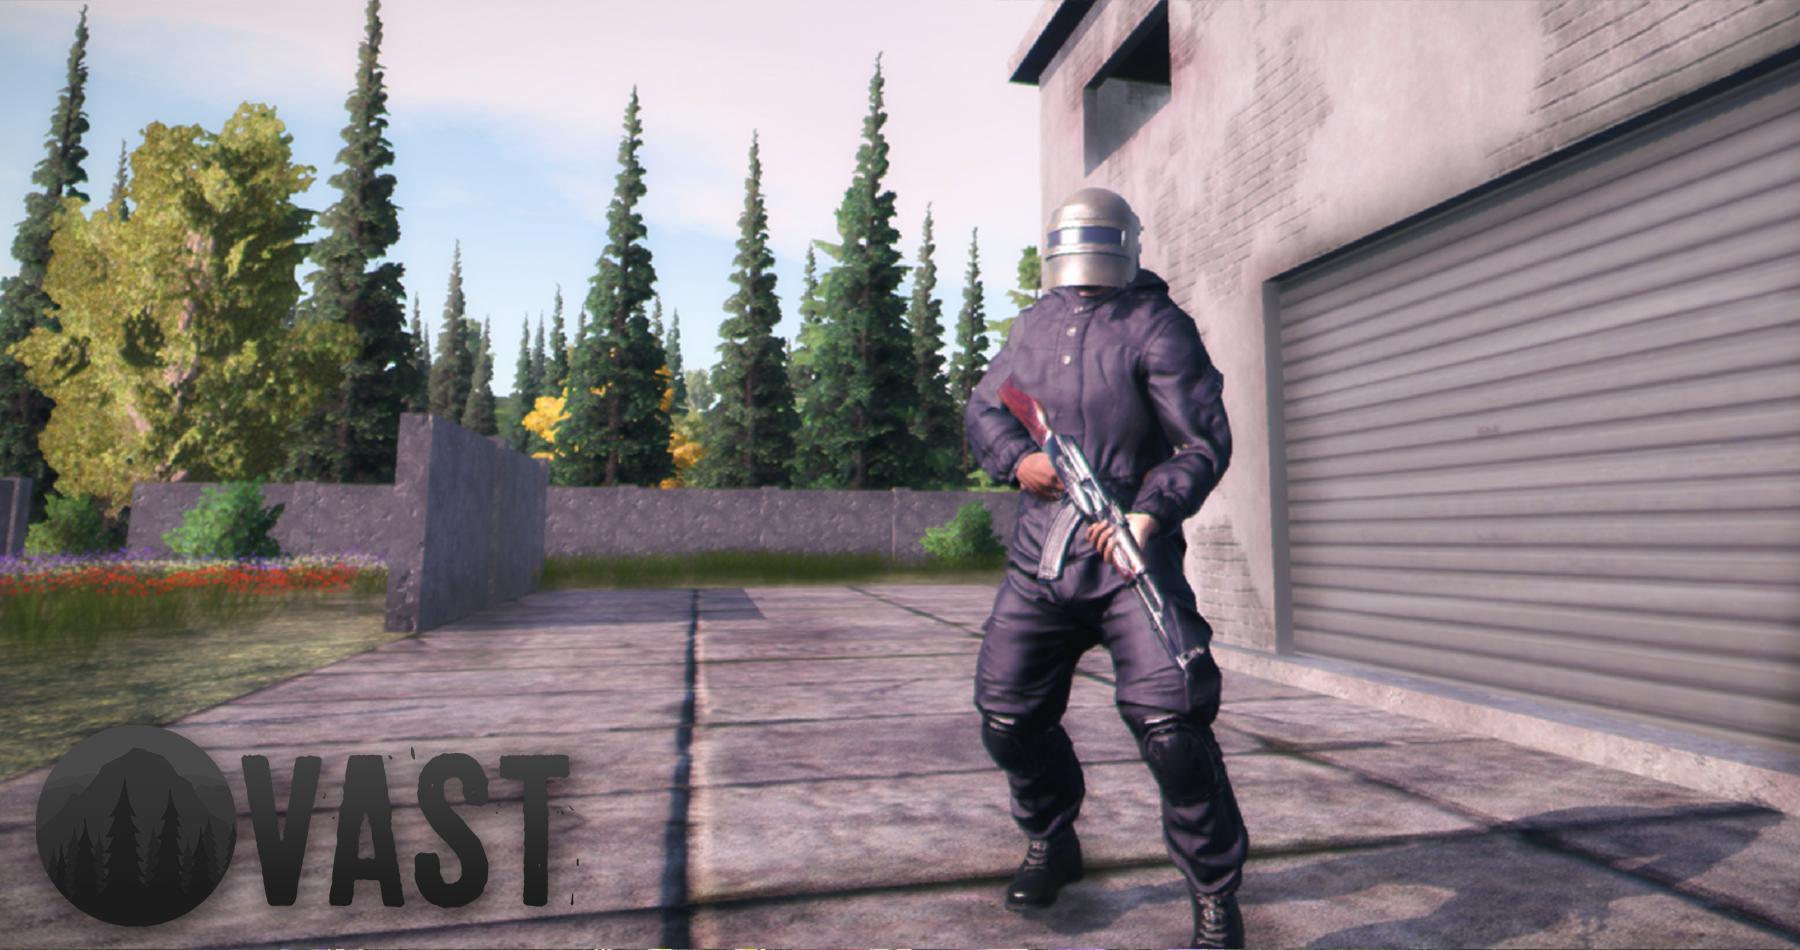 Vast Survival (Multiplayer) Open World. 1.0 Screenshot 3